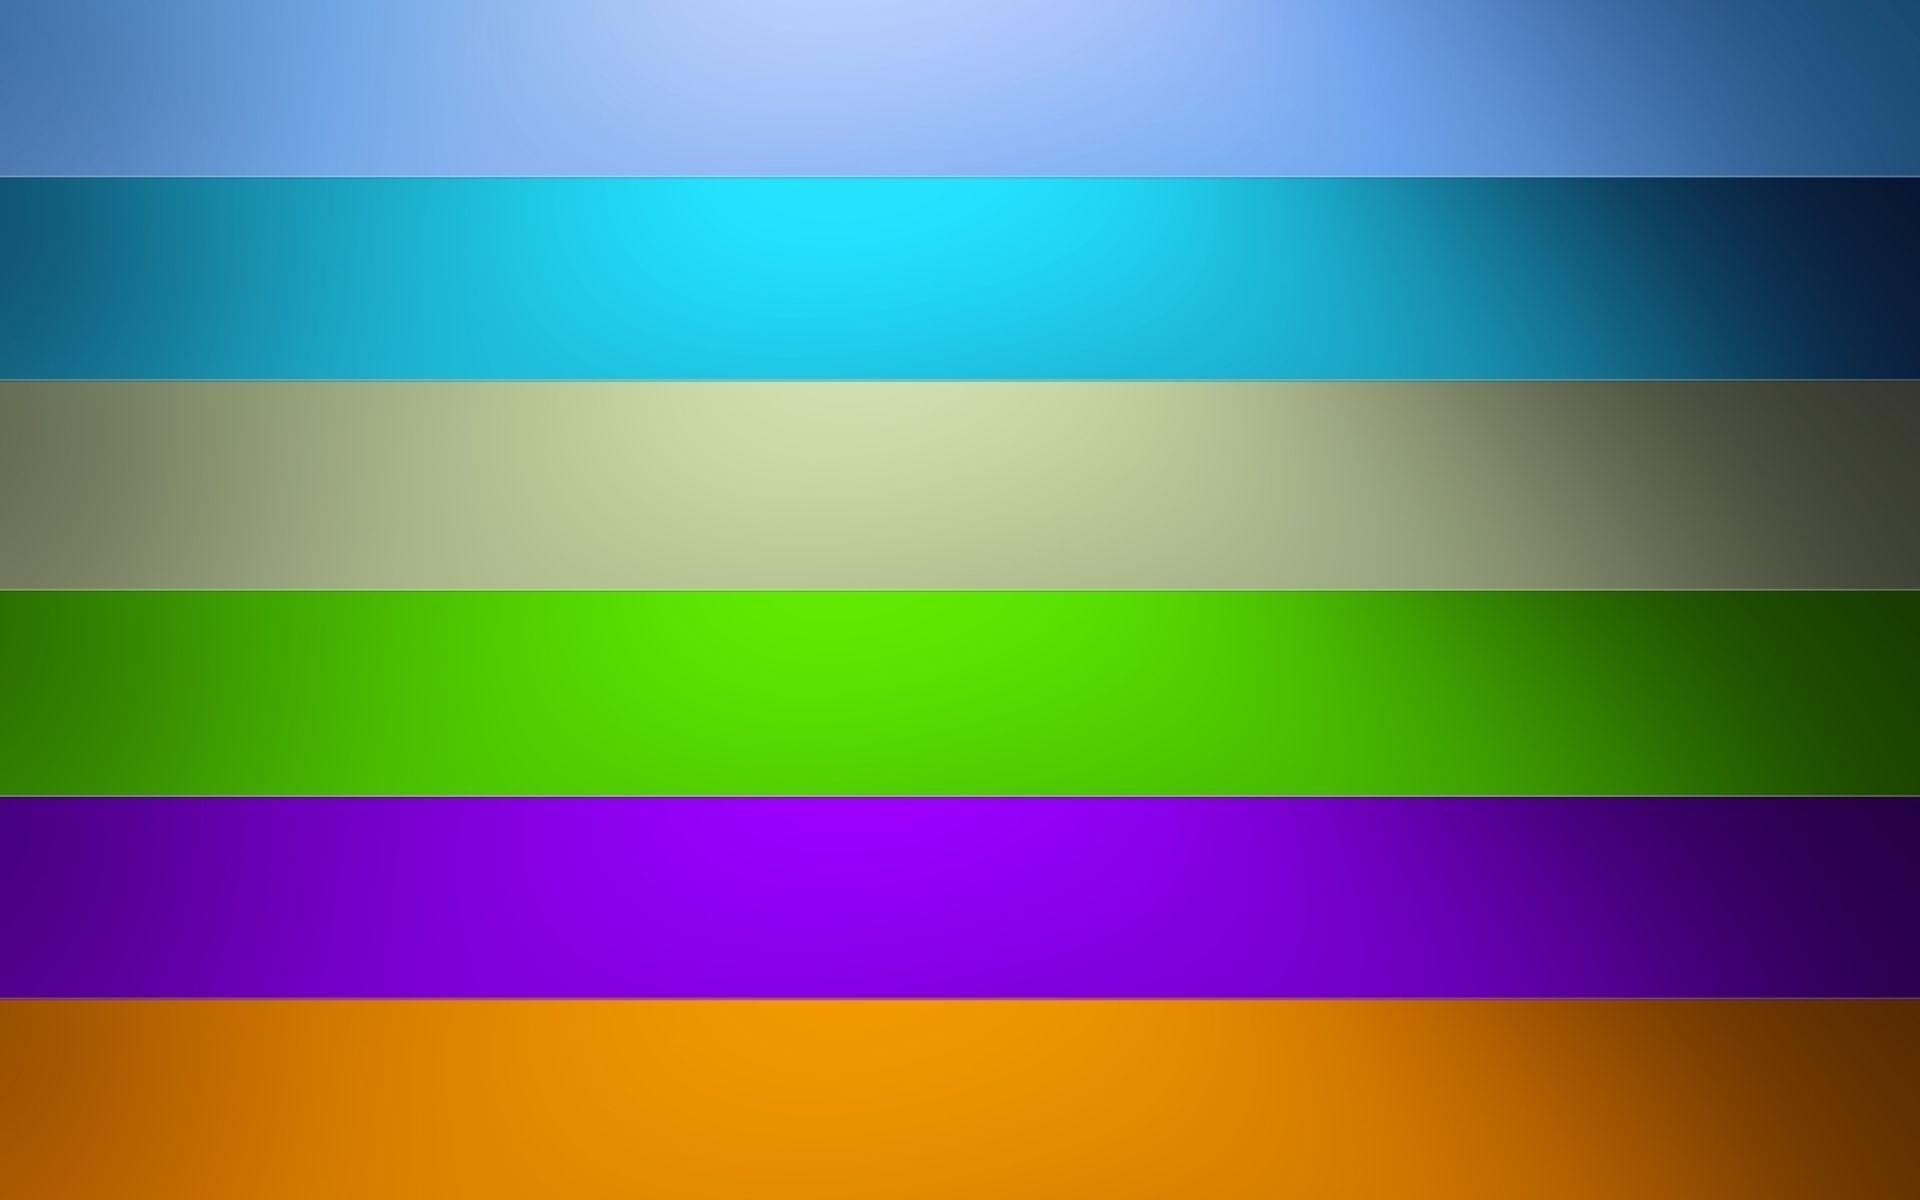 lines stripes horizontal f wallpaper background 1920x1200